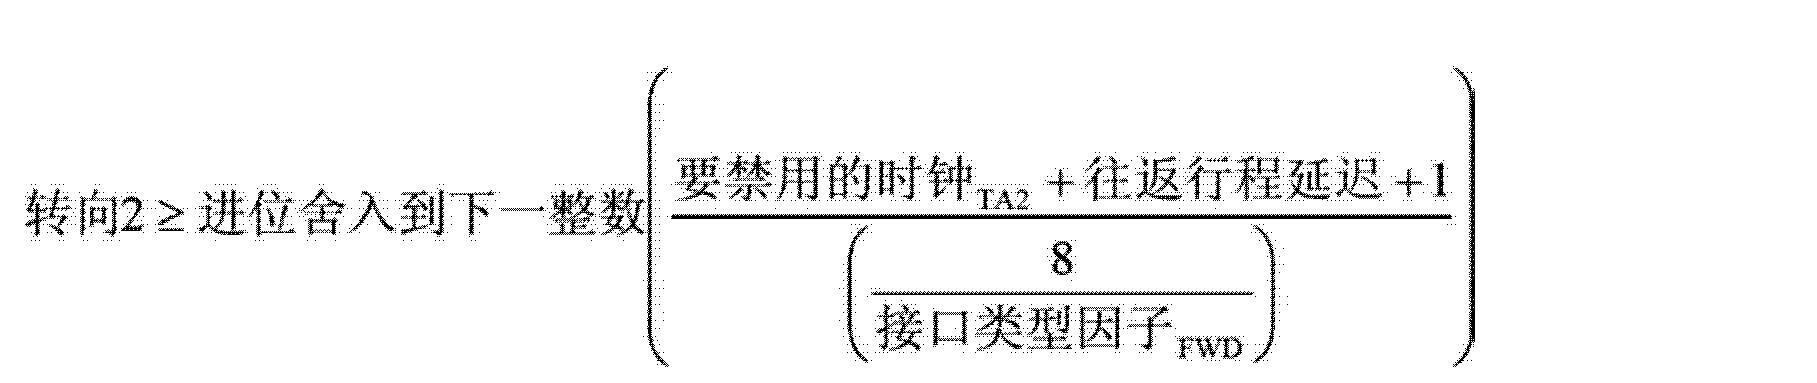 Figure CN102801595AD00834